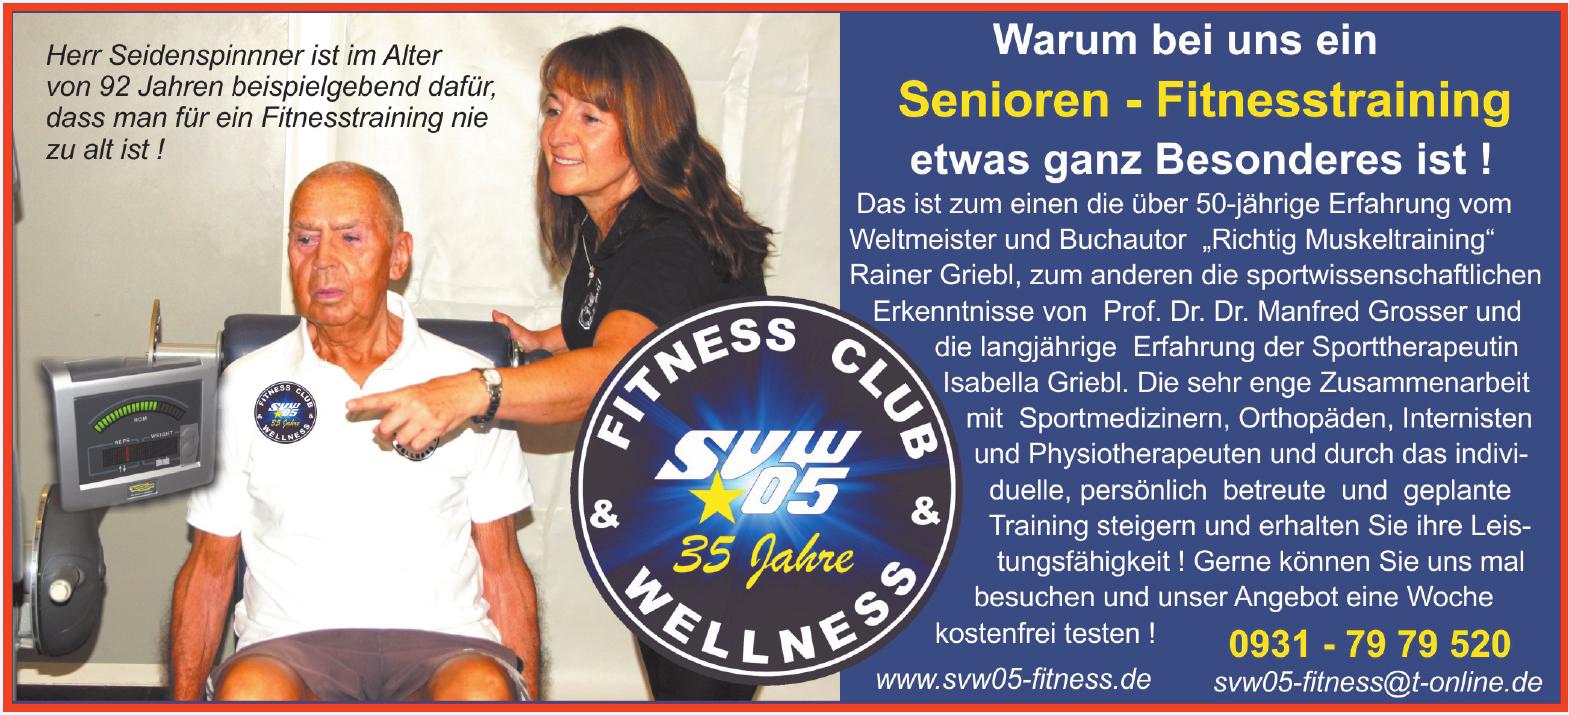 SVW05 Fitness Club & Wellness